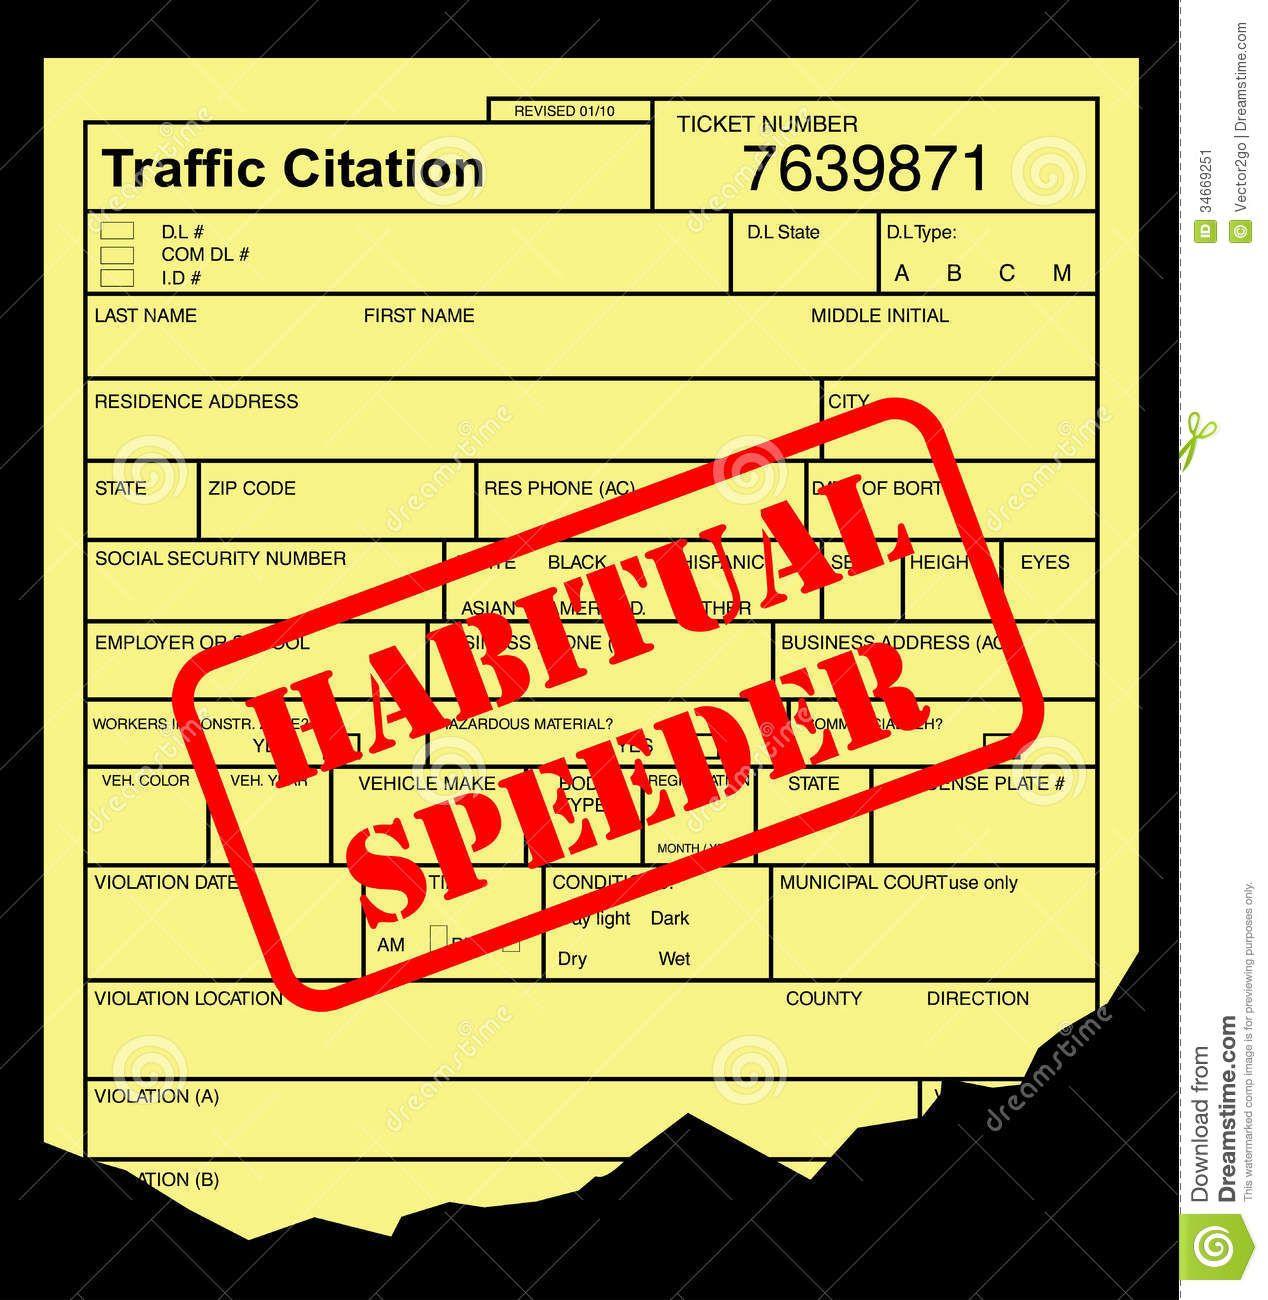 Speeding Ticket A Misdemeanor In Georgia? Atlanta DUI Lawyer Jim